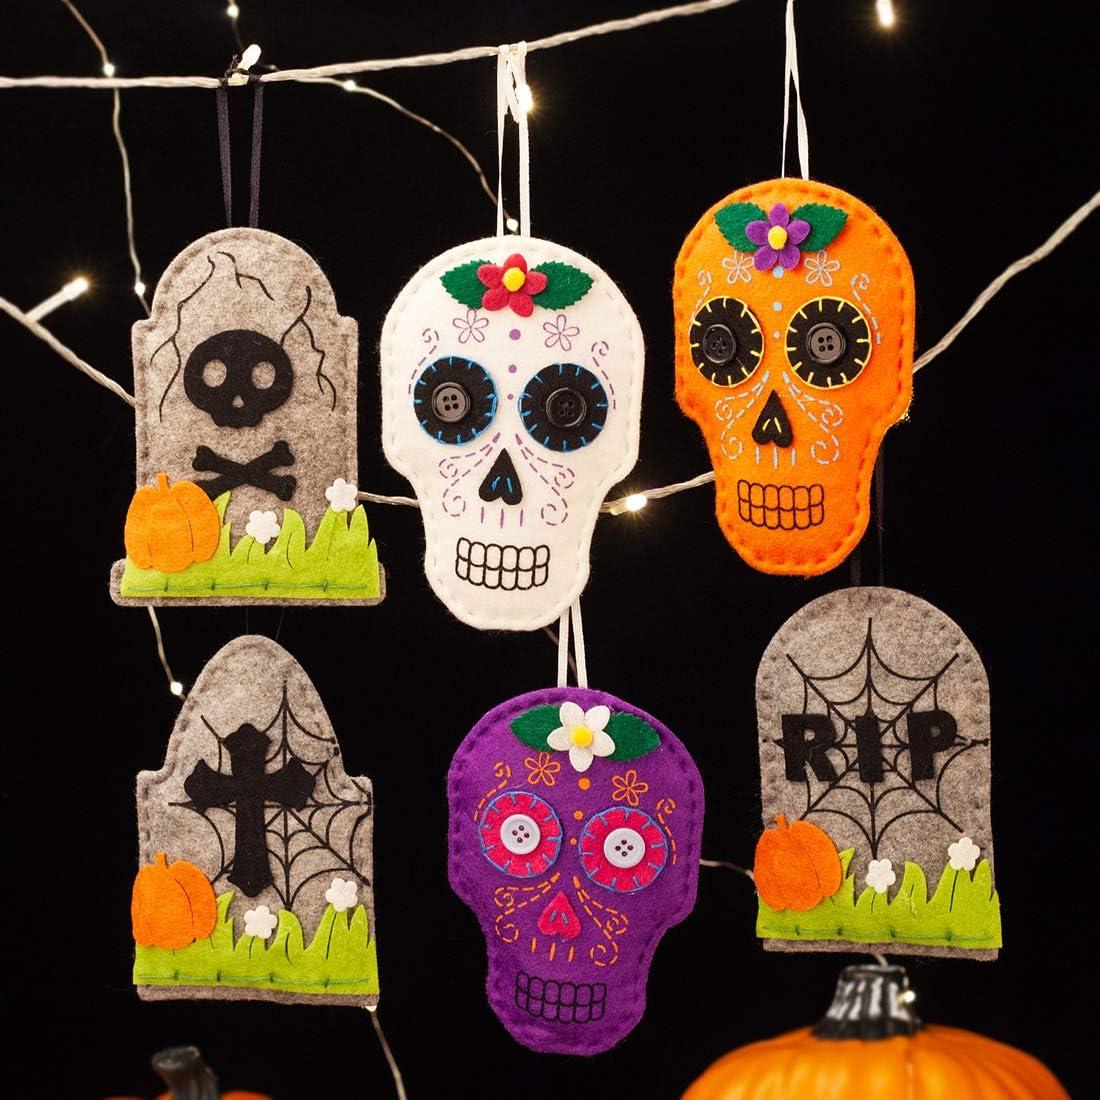 EDLDECCO Halloween Ornaments Set of 6 Home Decorations Skull Tomb Felt Door Window Wall Indoor Outdoor use Party Supplies Hanging Decor